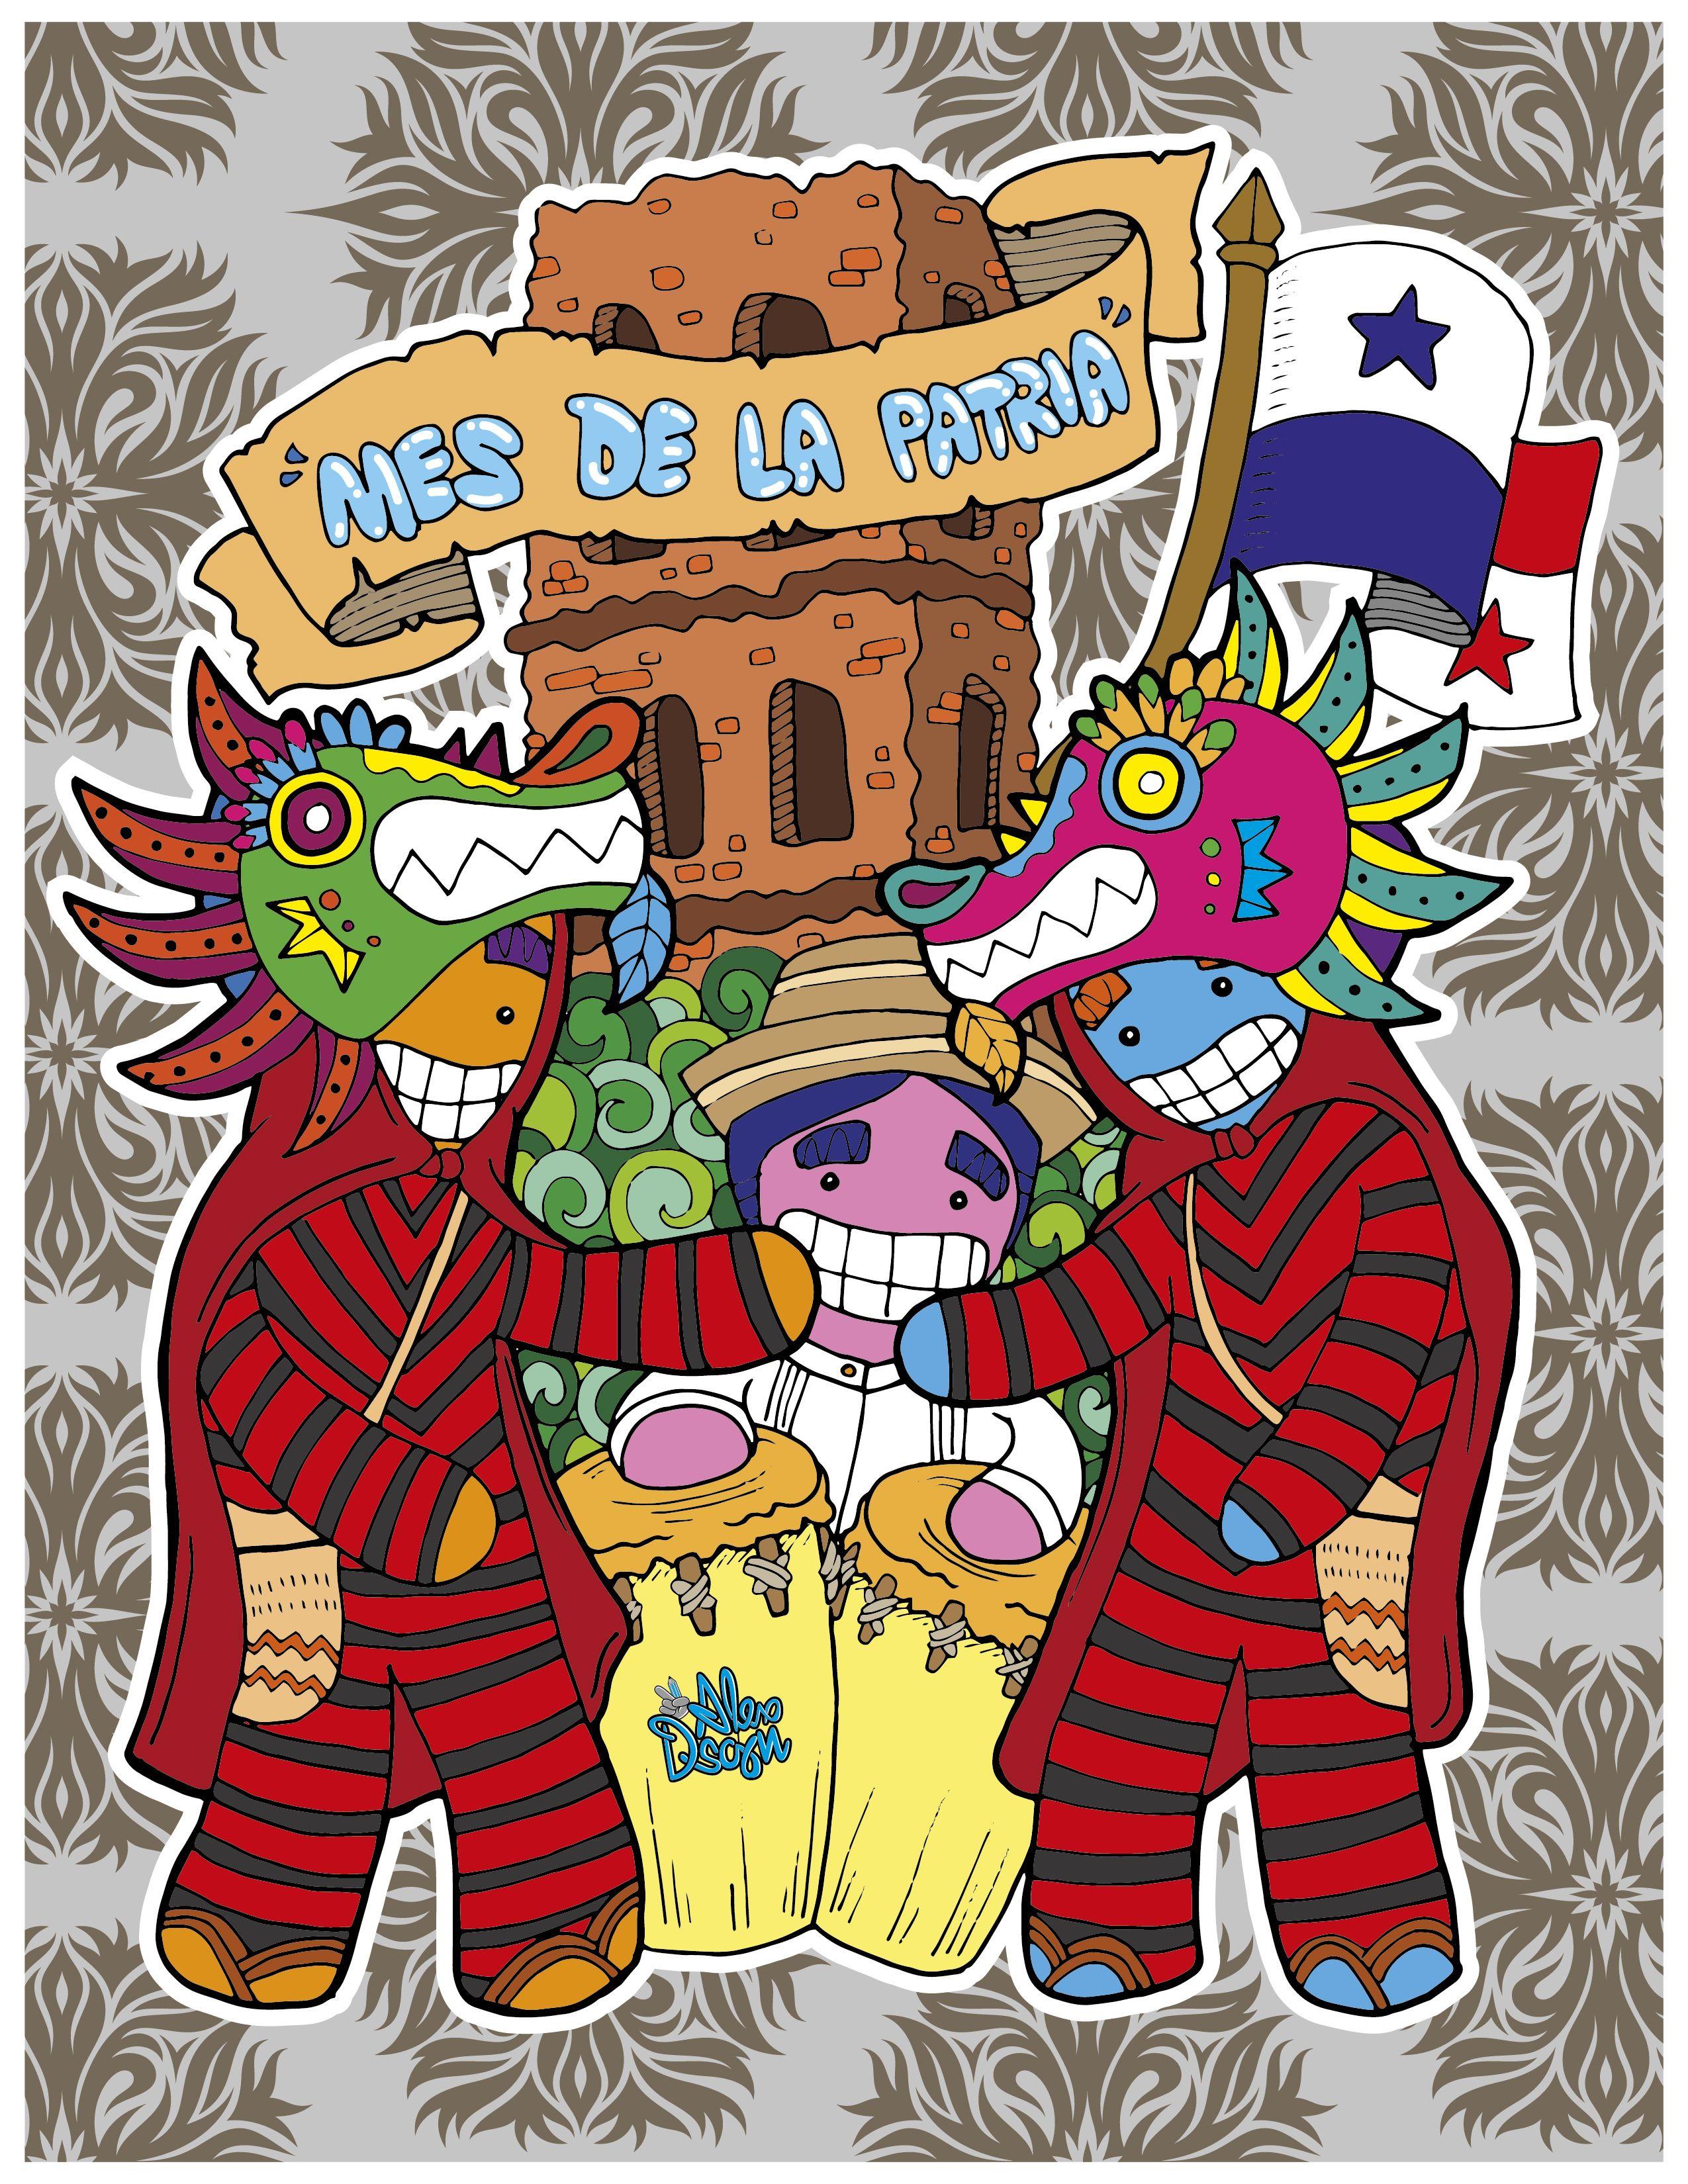 Mes De La Patria By Alexdsgn Graffiti Art Illustration